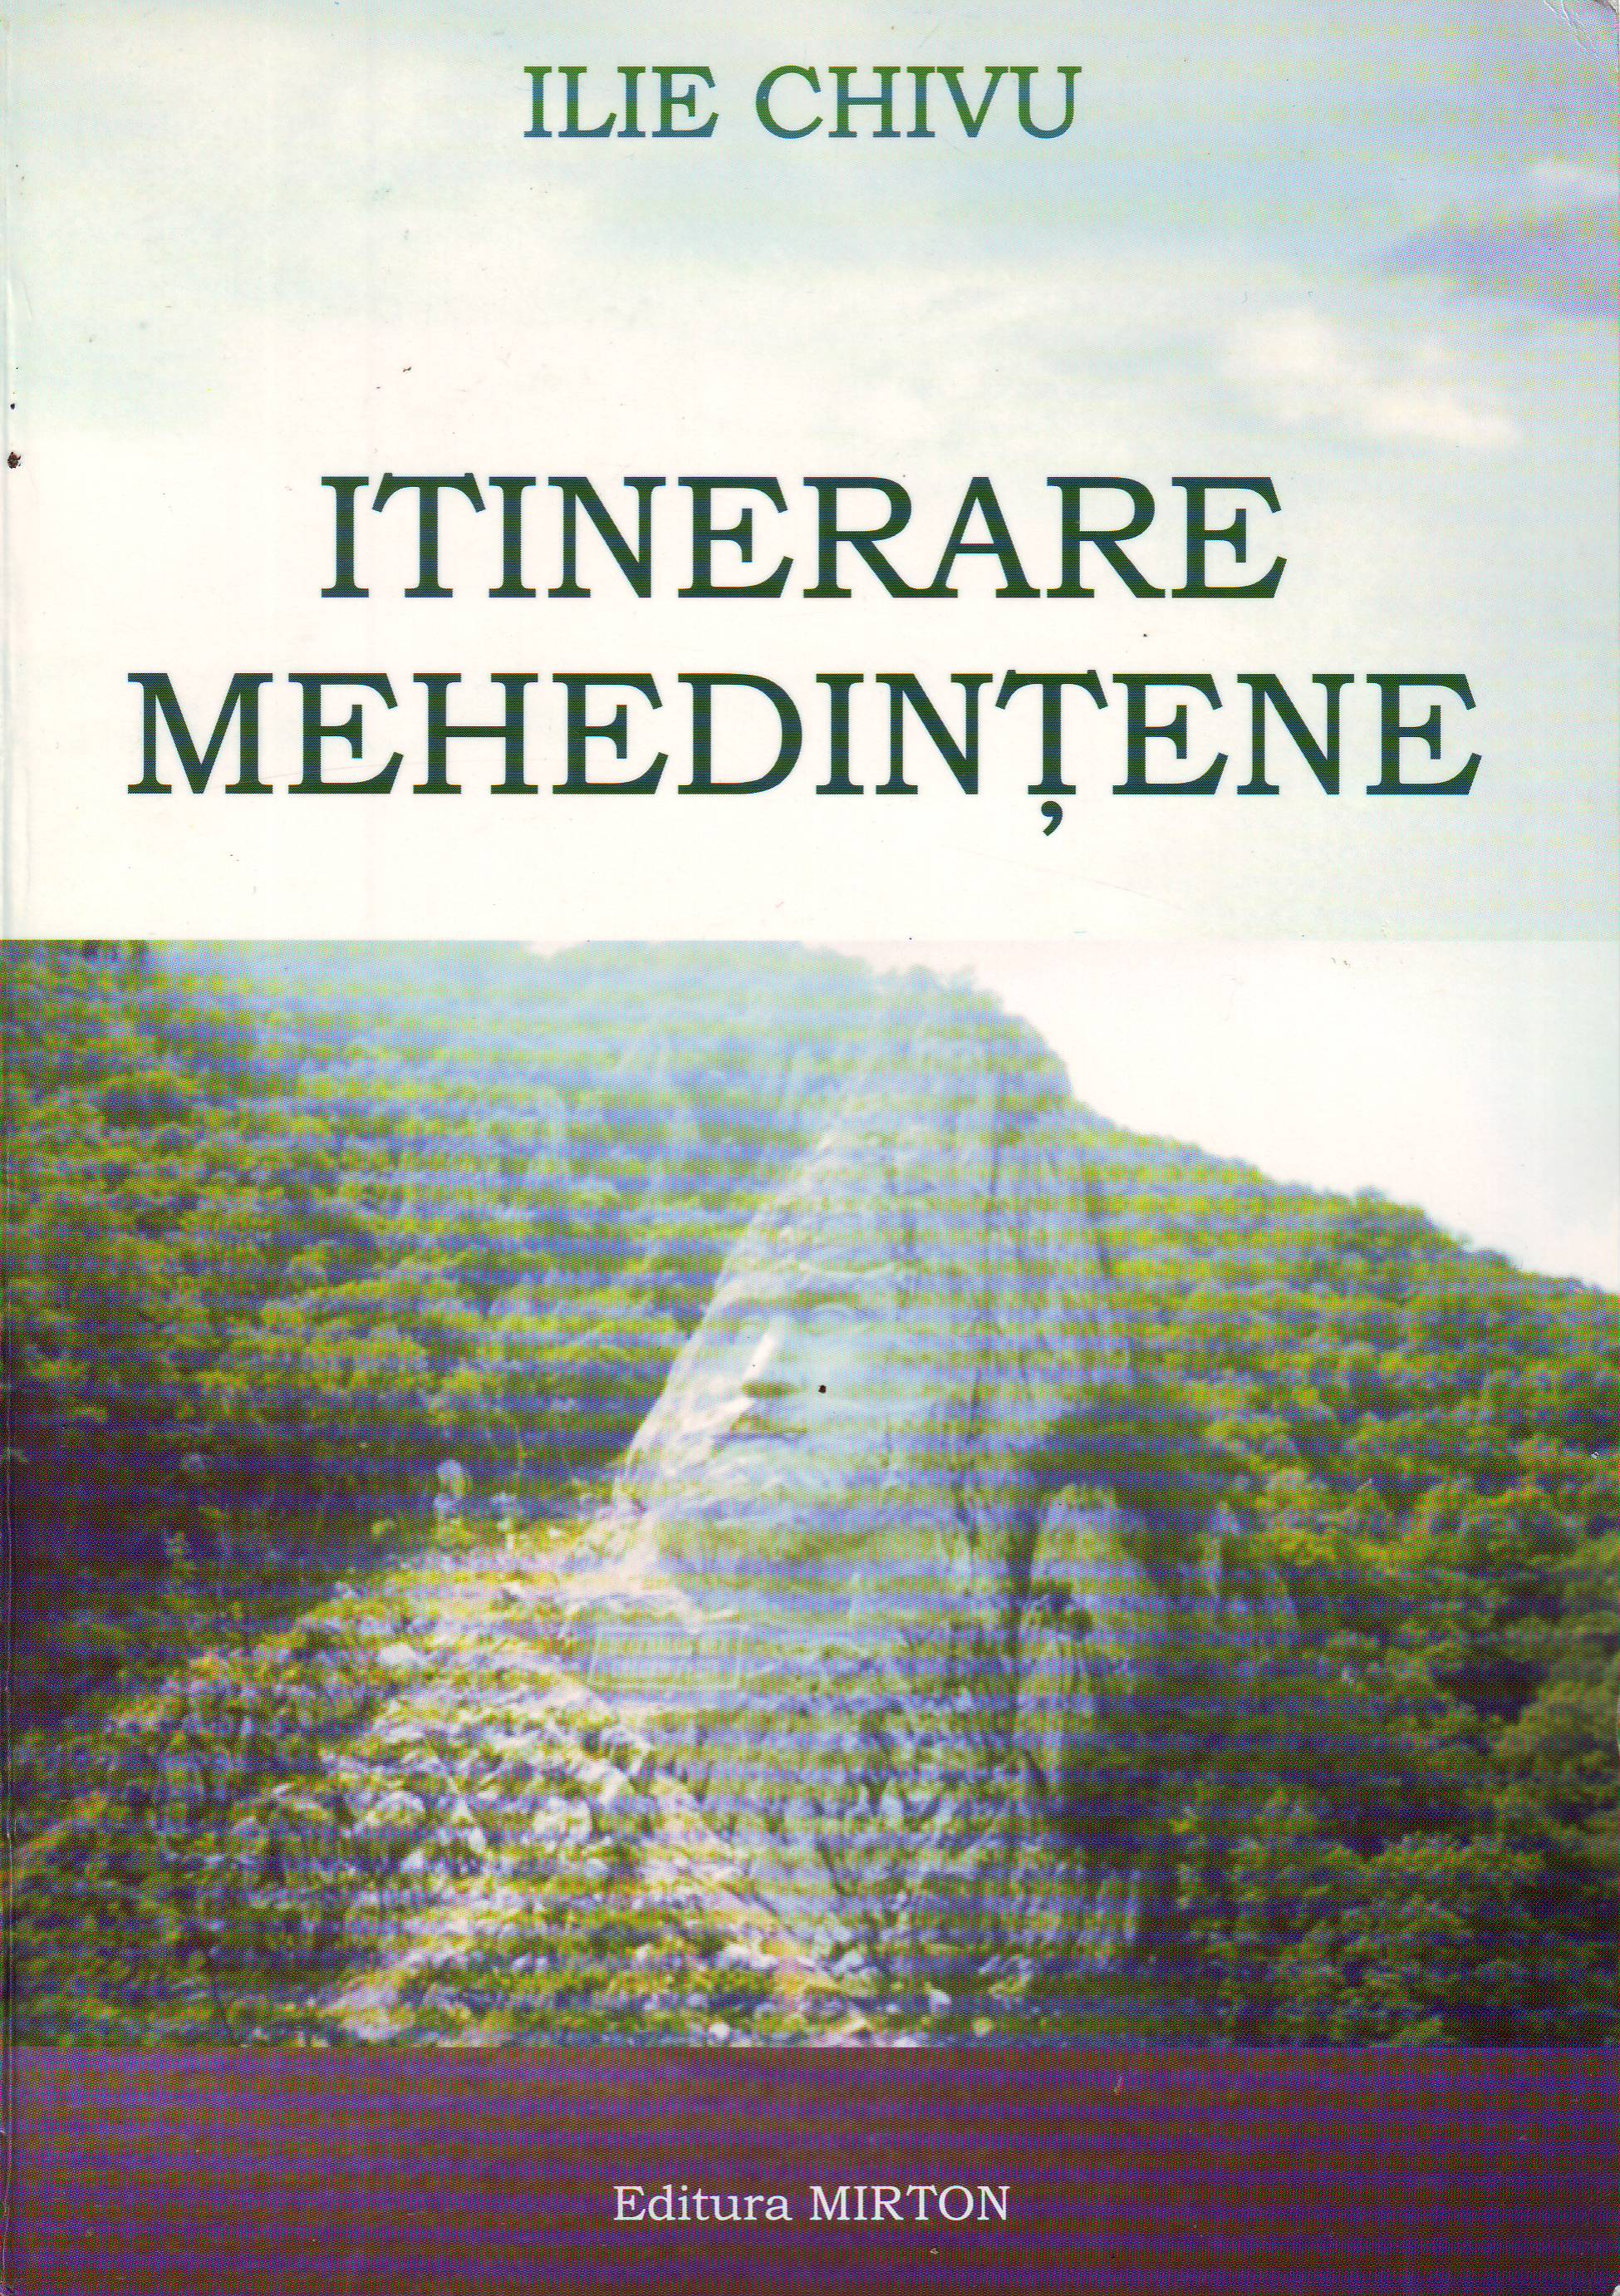 Itinerare_mehedintene